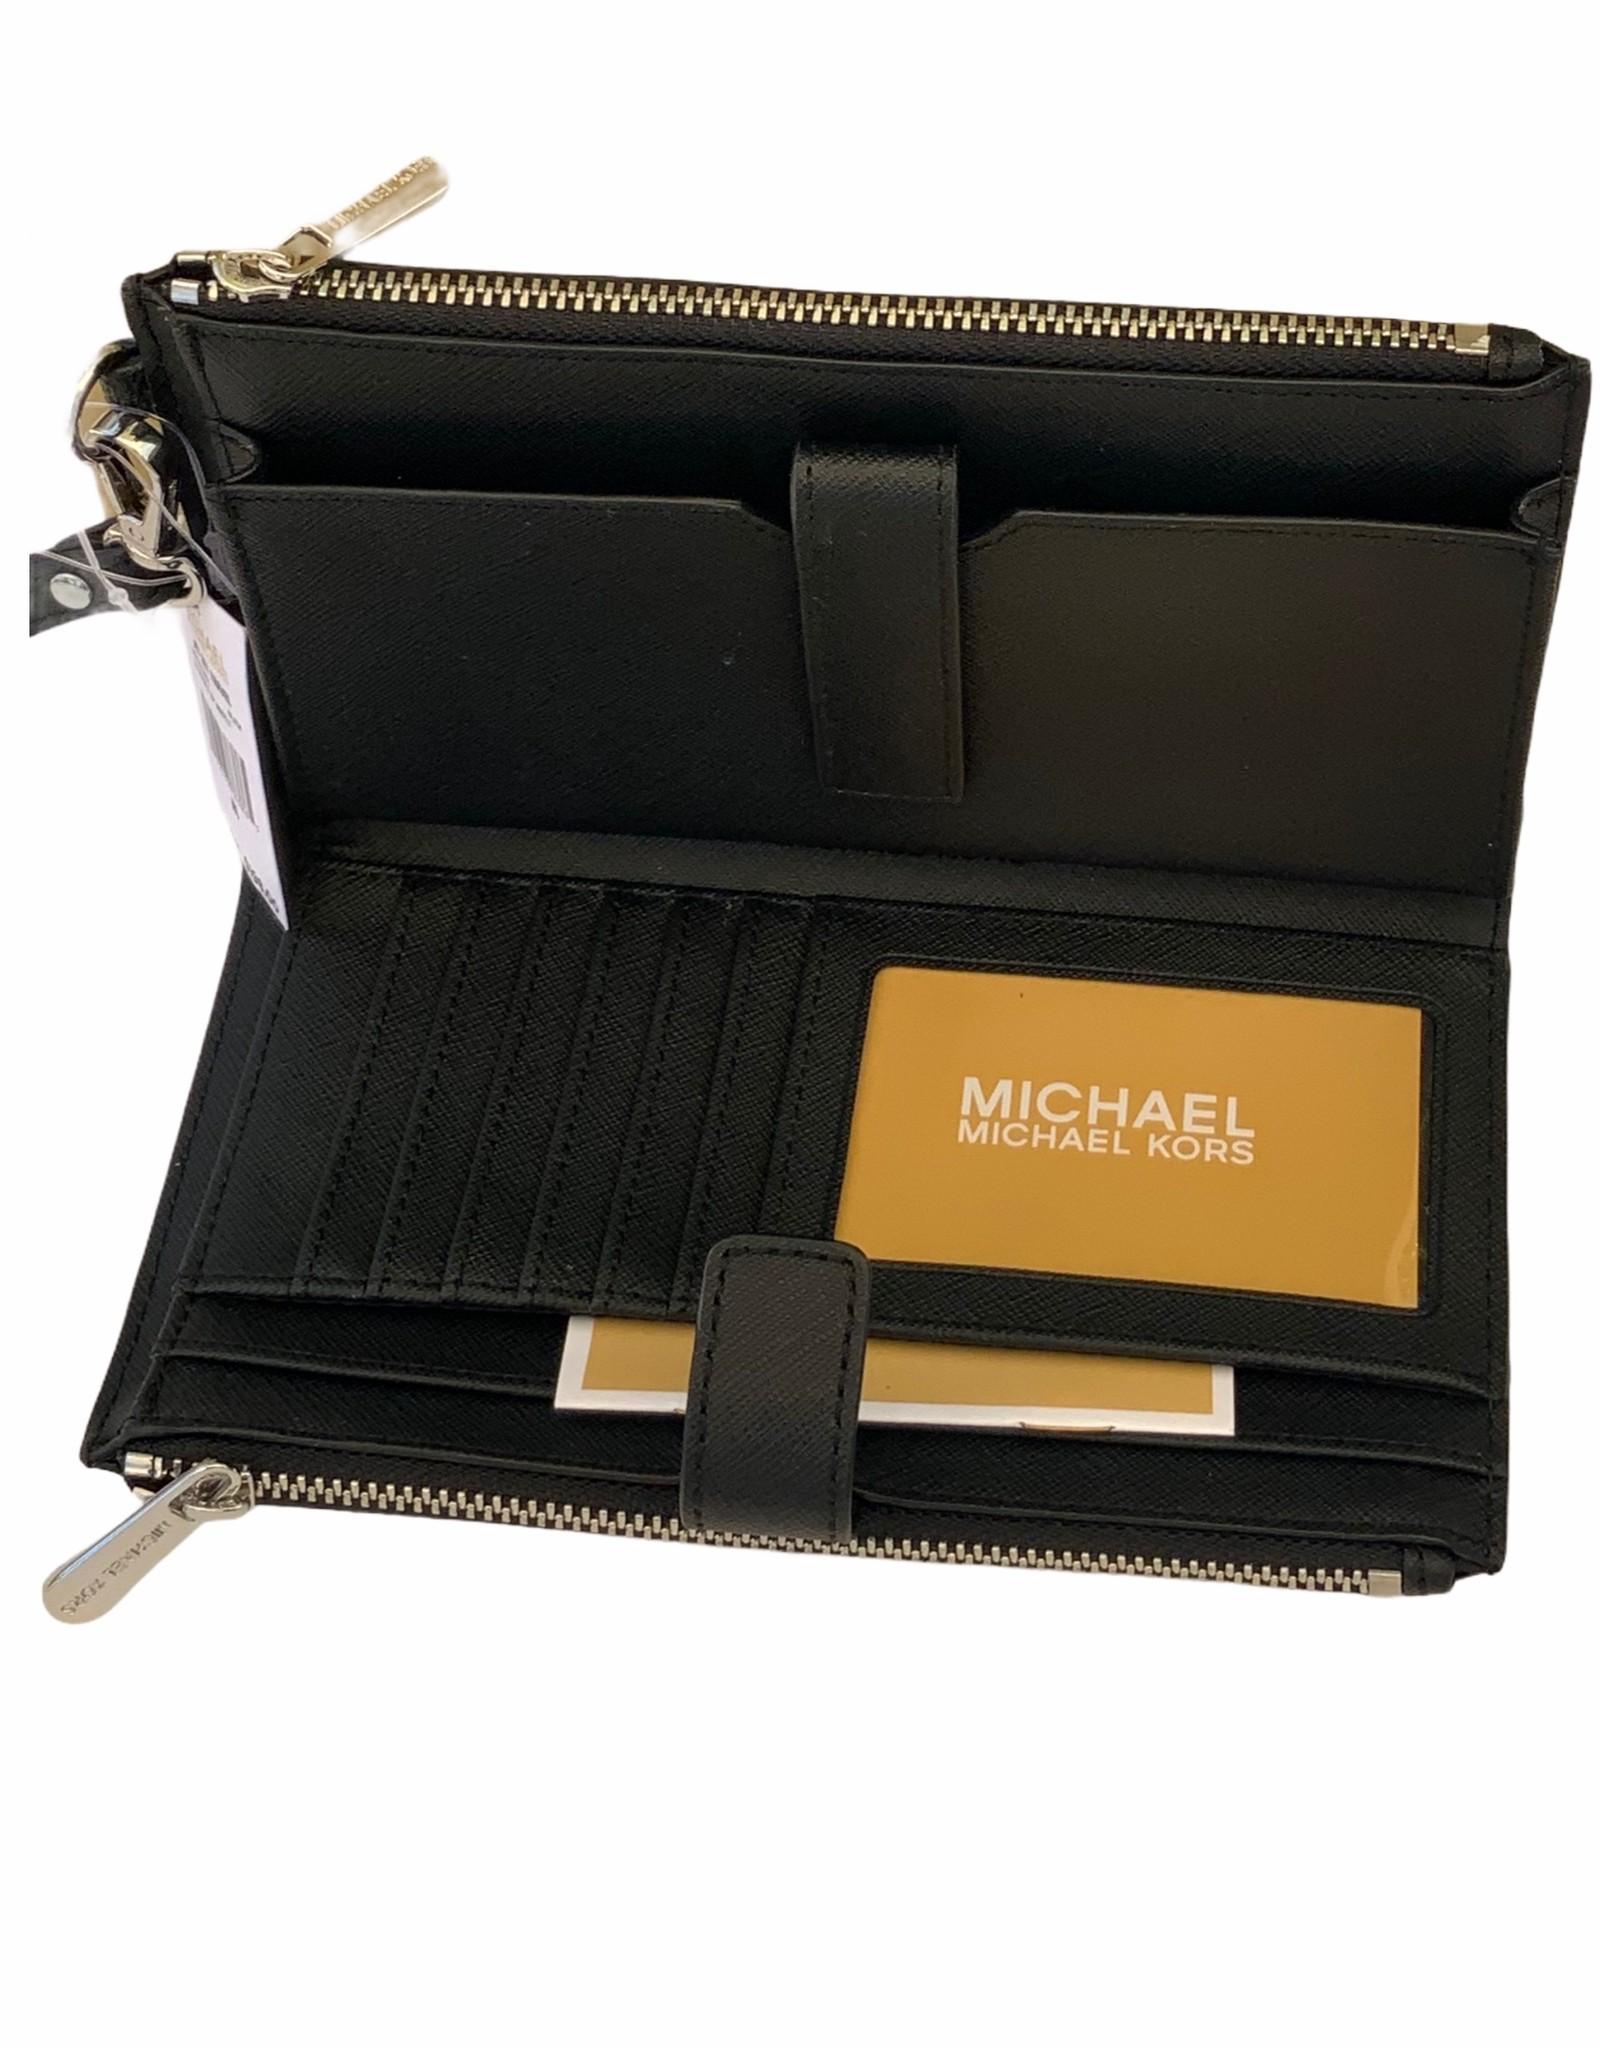 Michael Kors Michael Kors Wristlet Double Zip Jet Set Travel